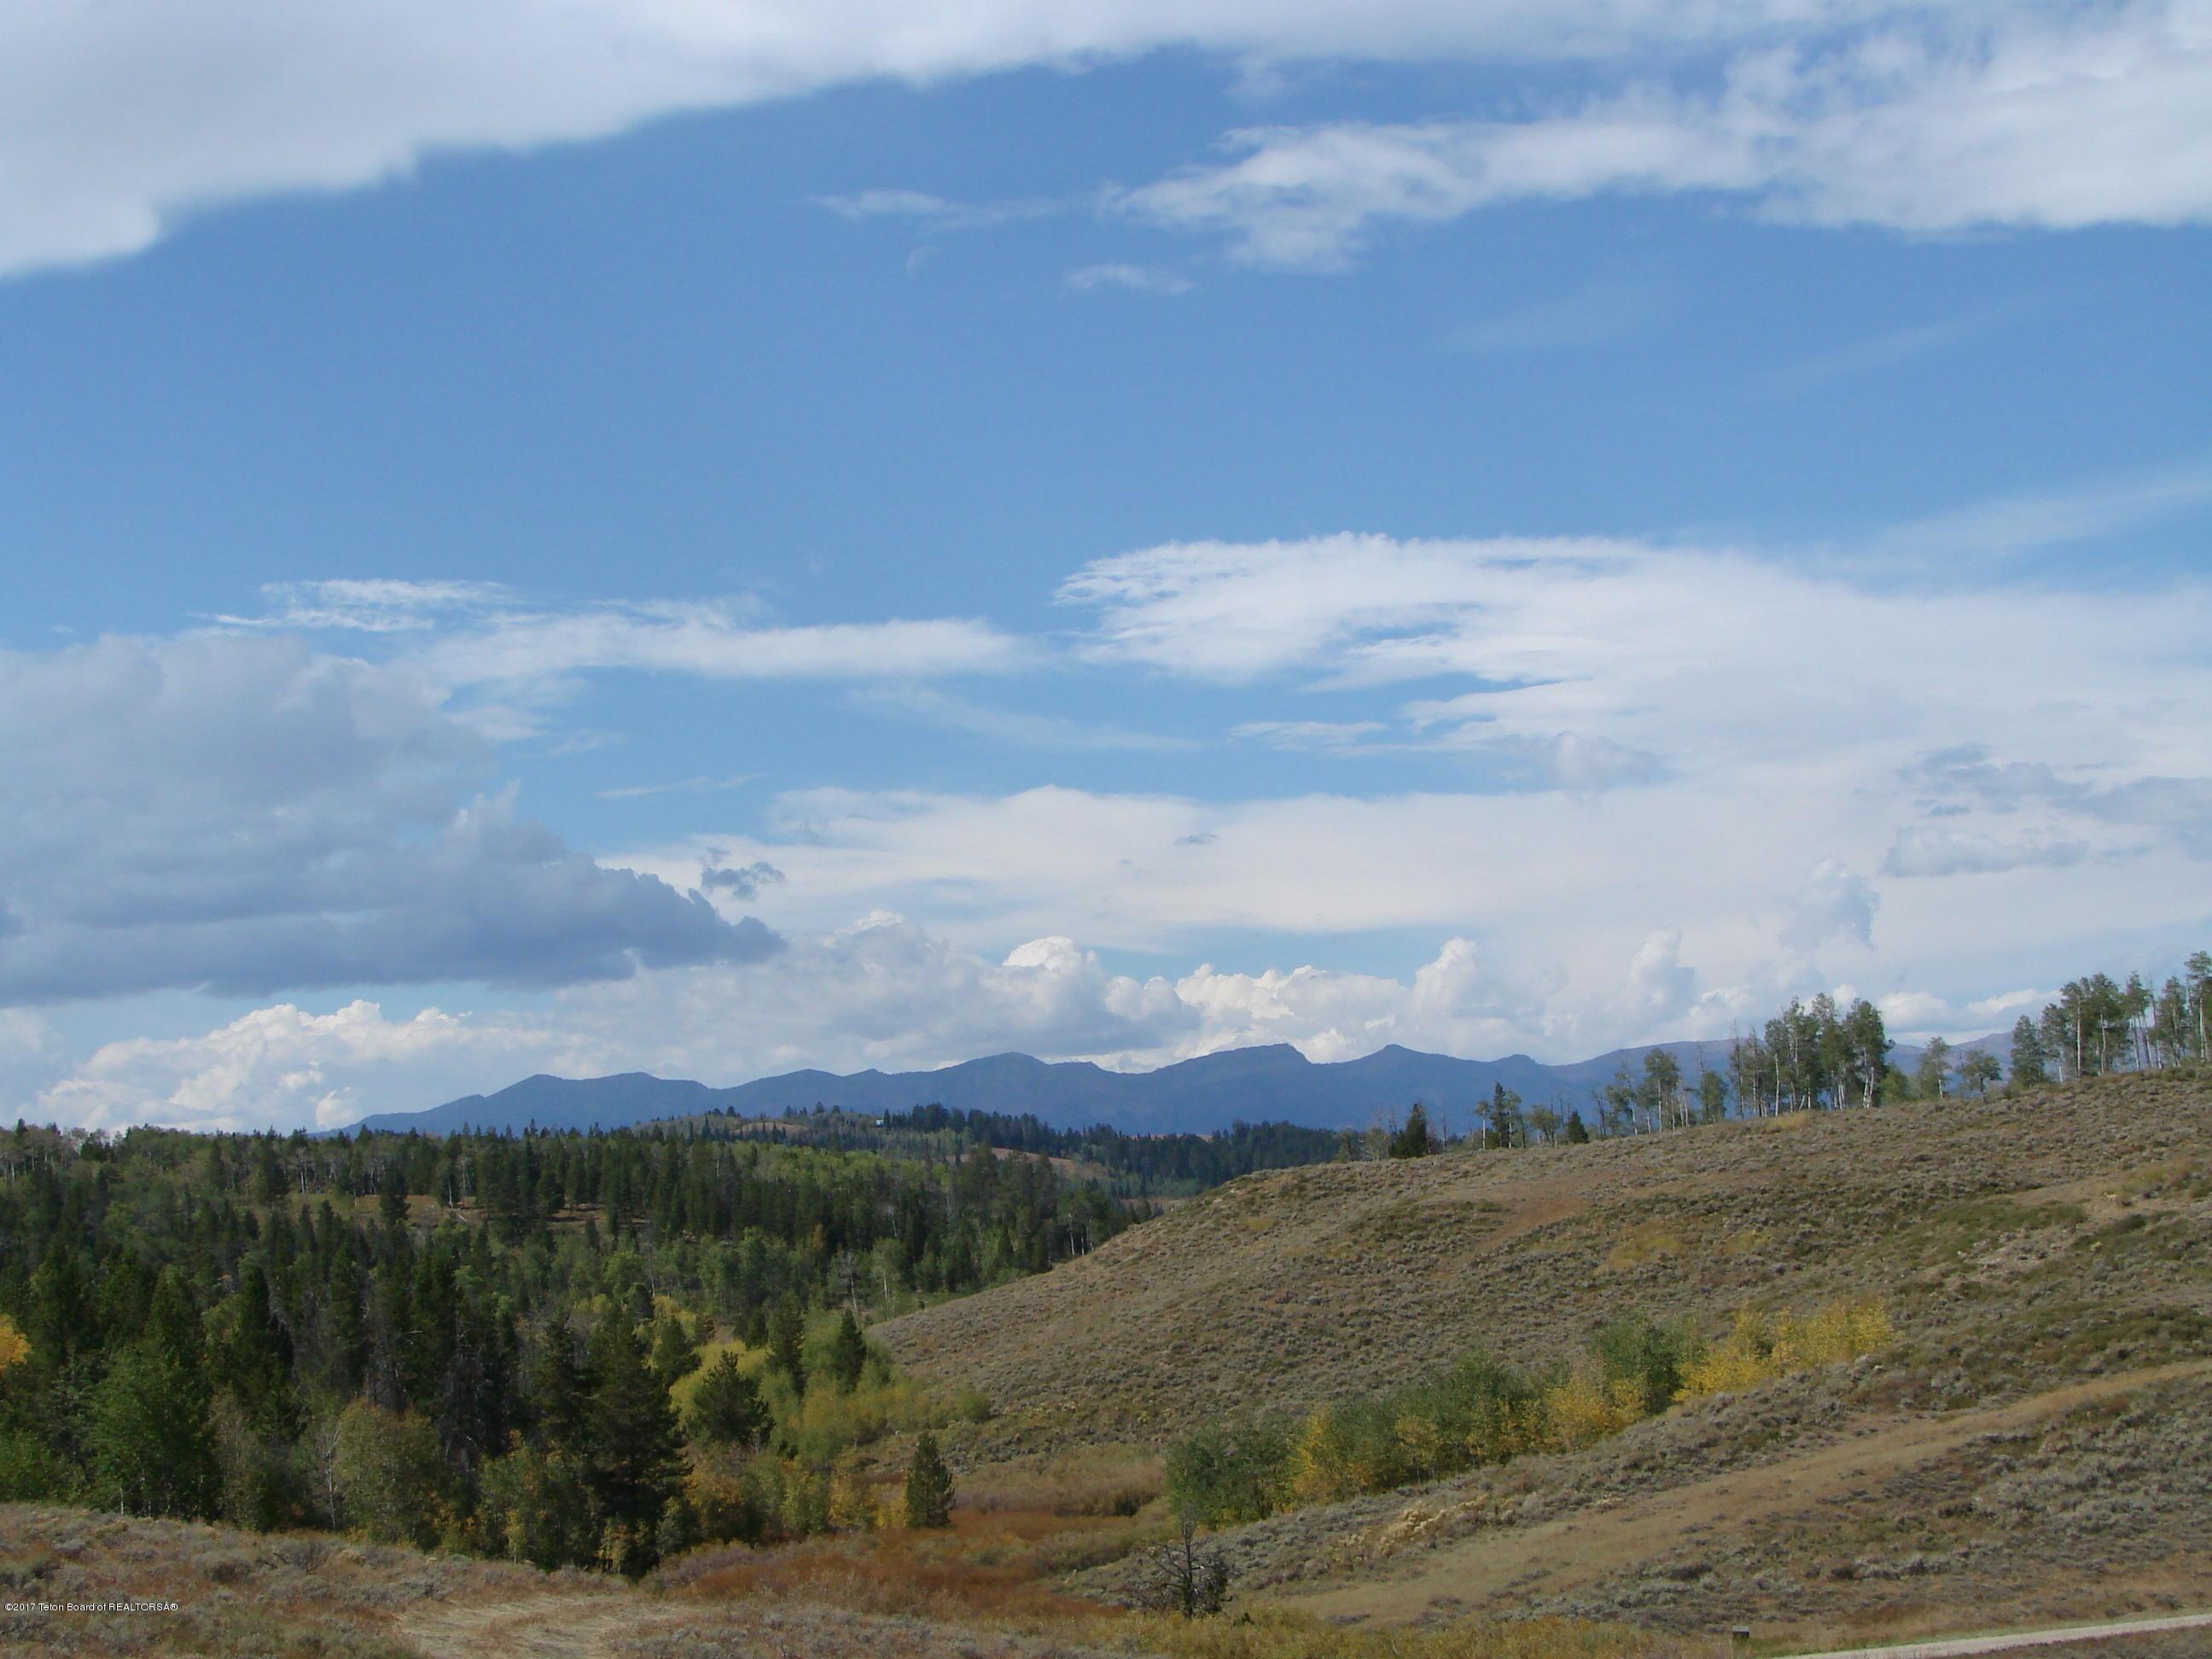 Ridgeline and Valley Views